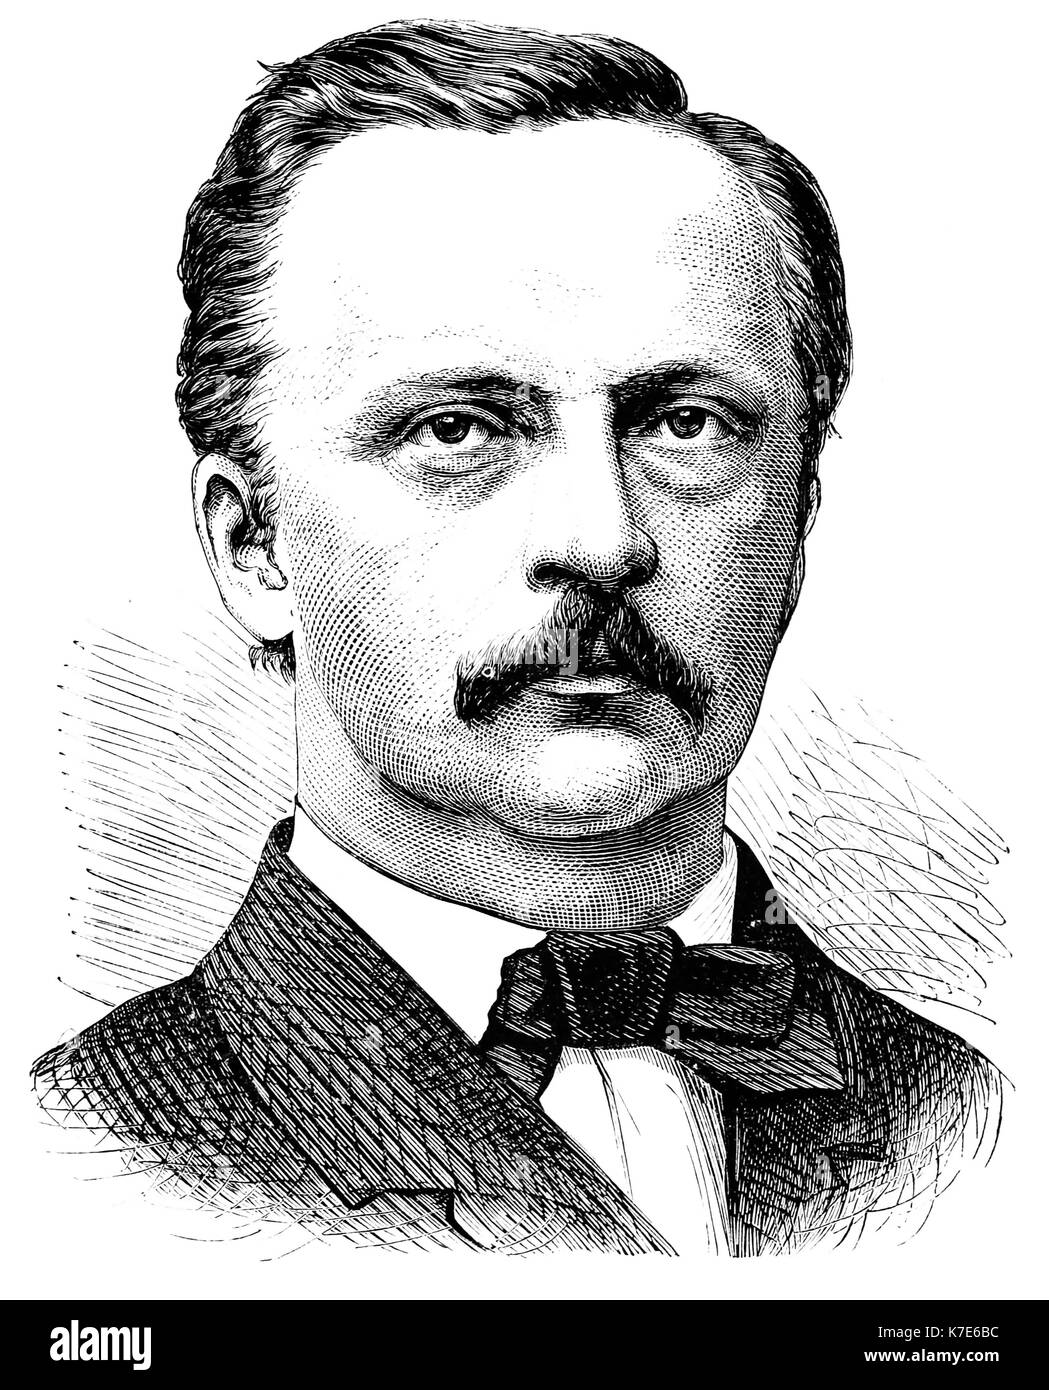 HERMANN von HELMHOLTZ (1821-1894) German physician and physicist - Stock Image